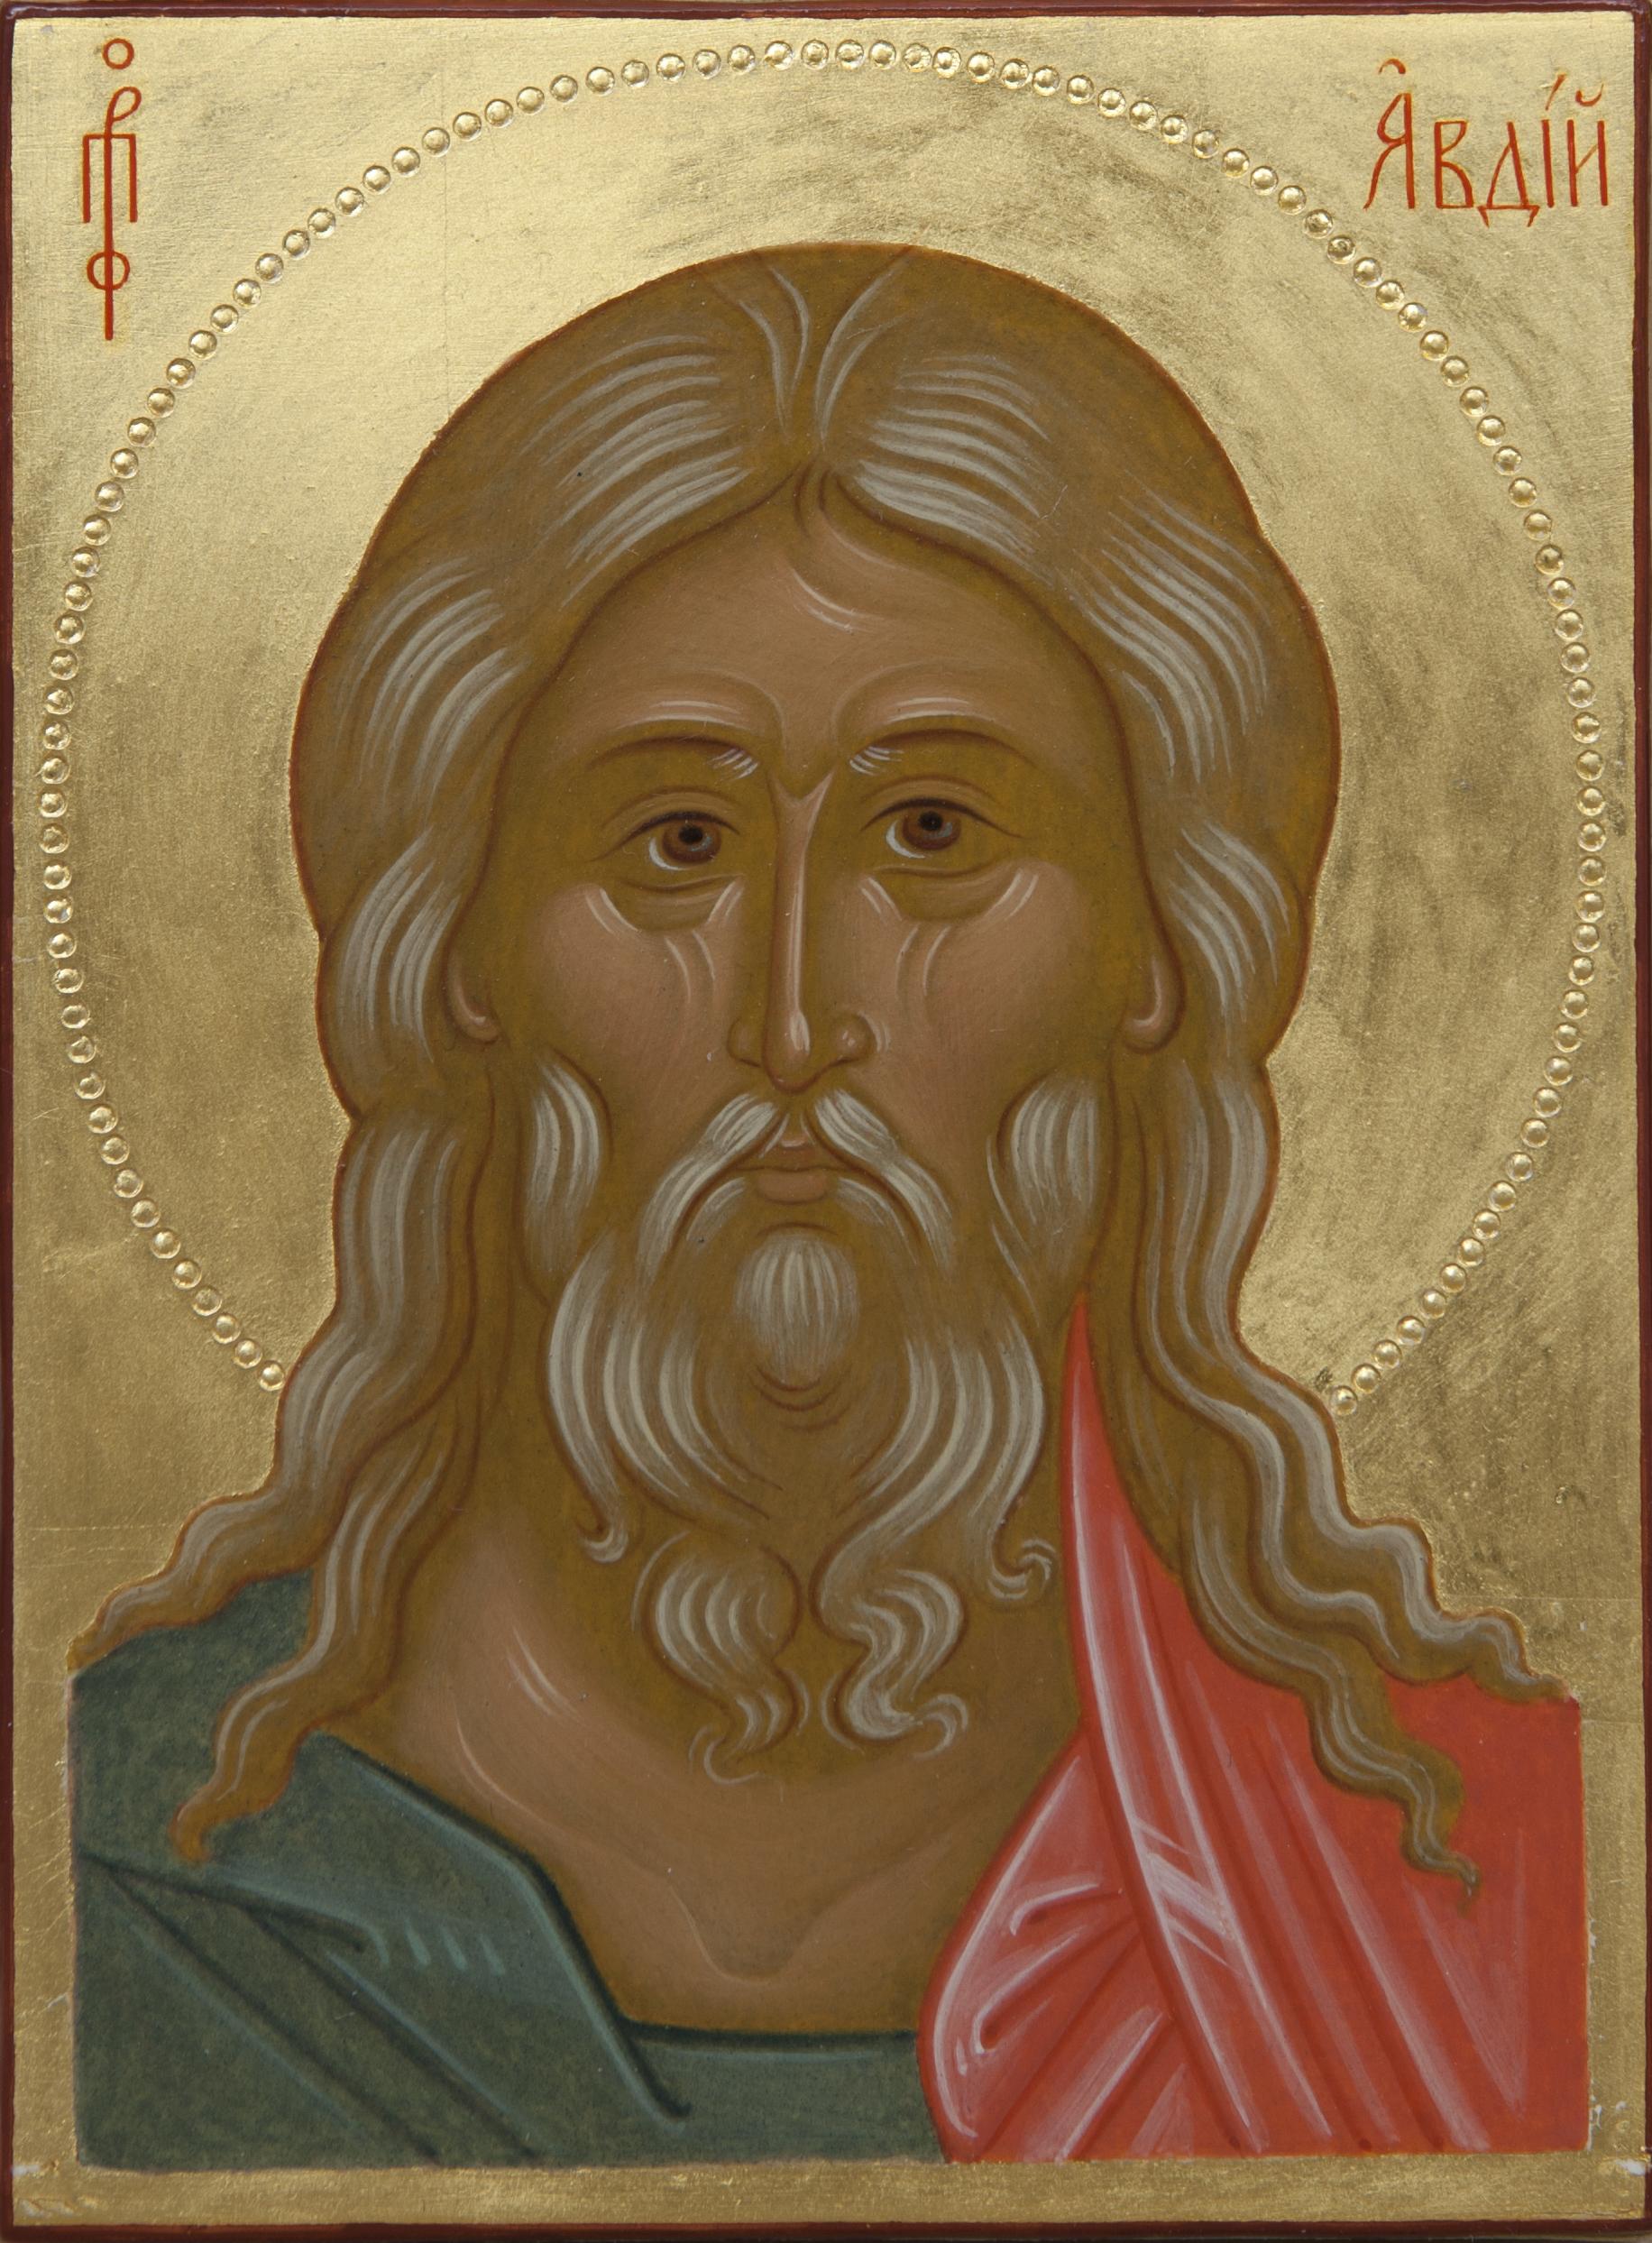 St. Obadiah the Prophet